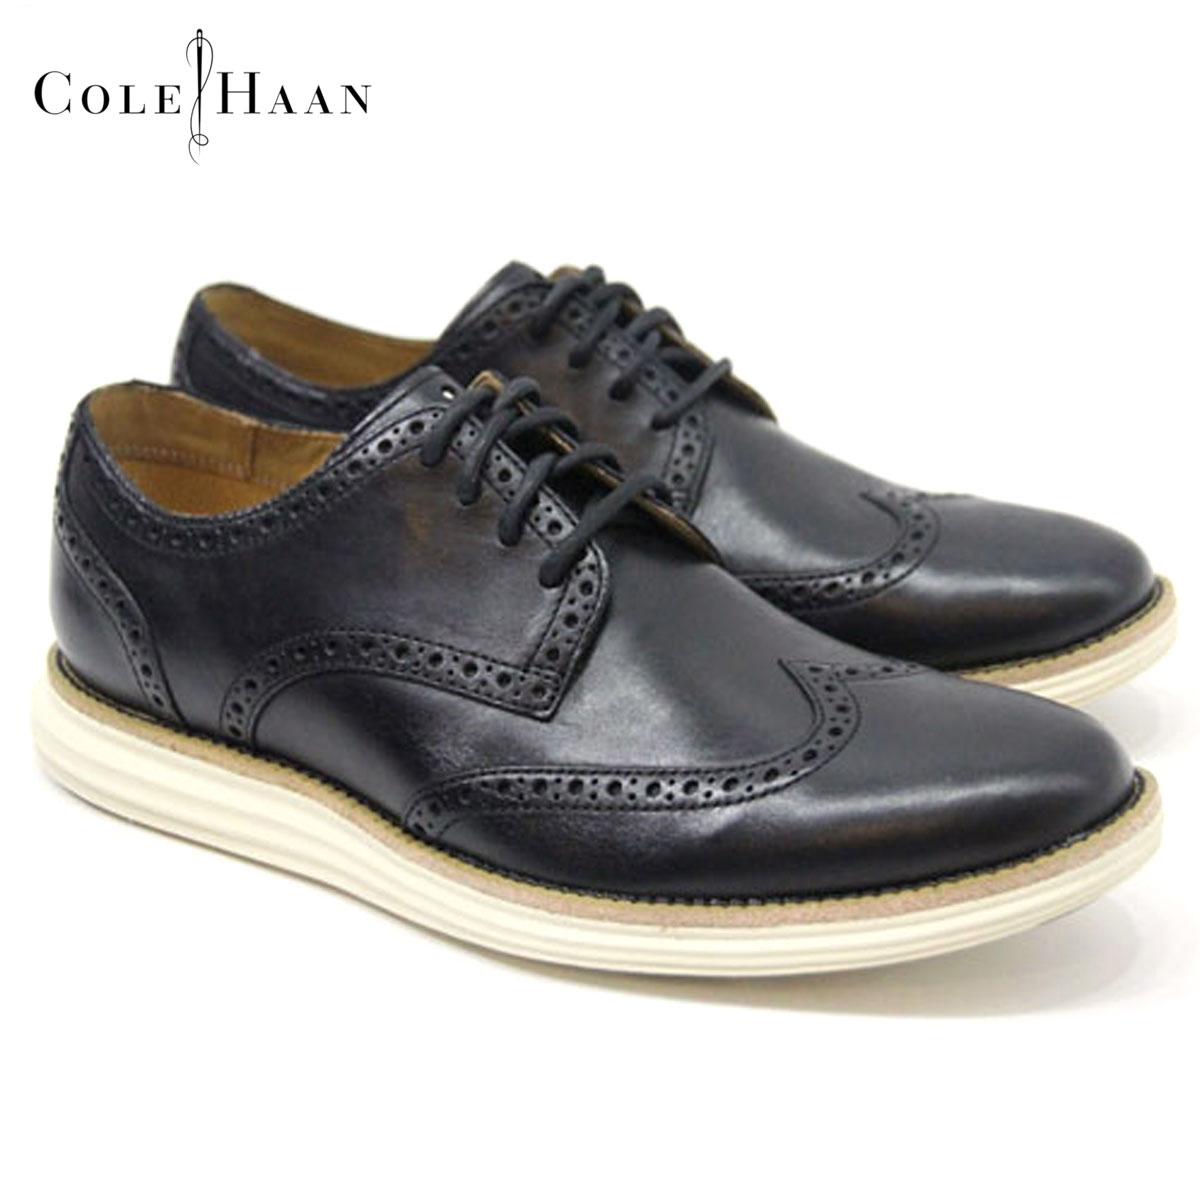 all black cole haans